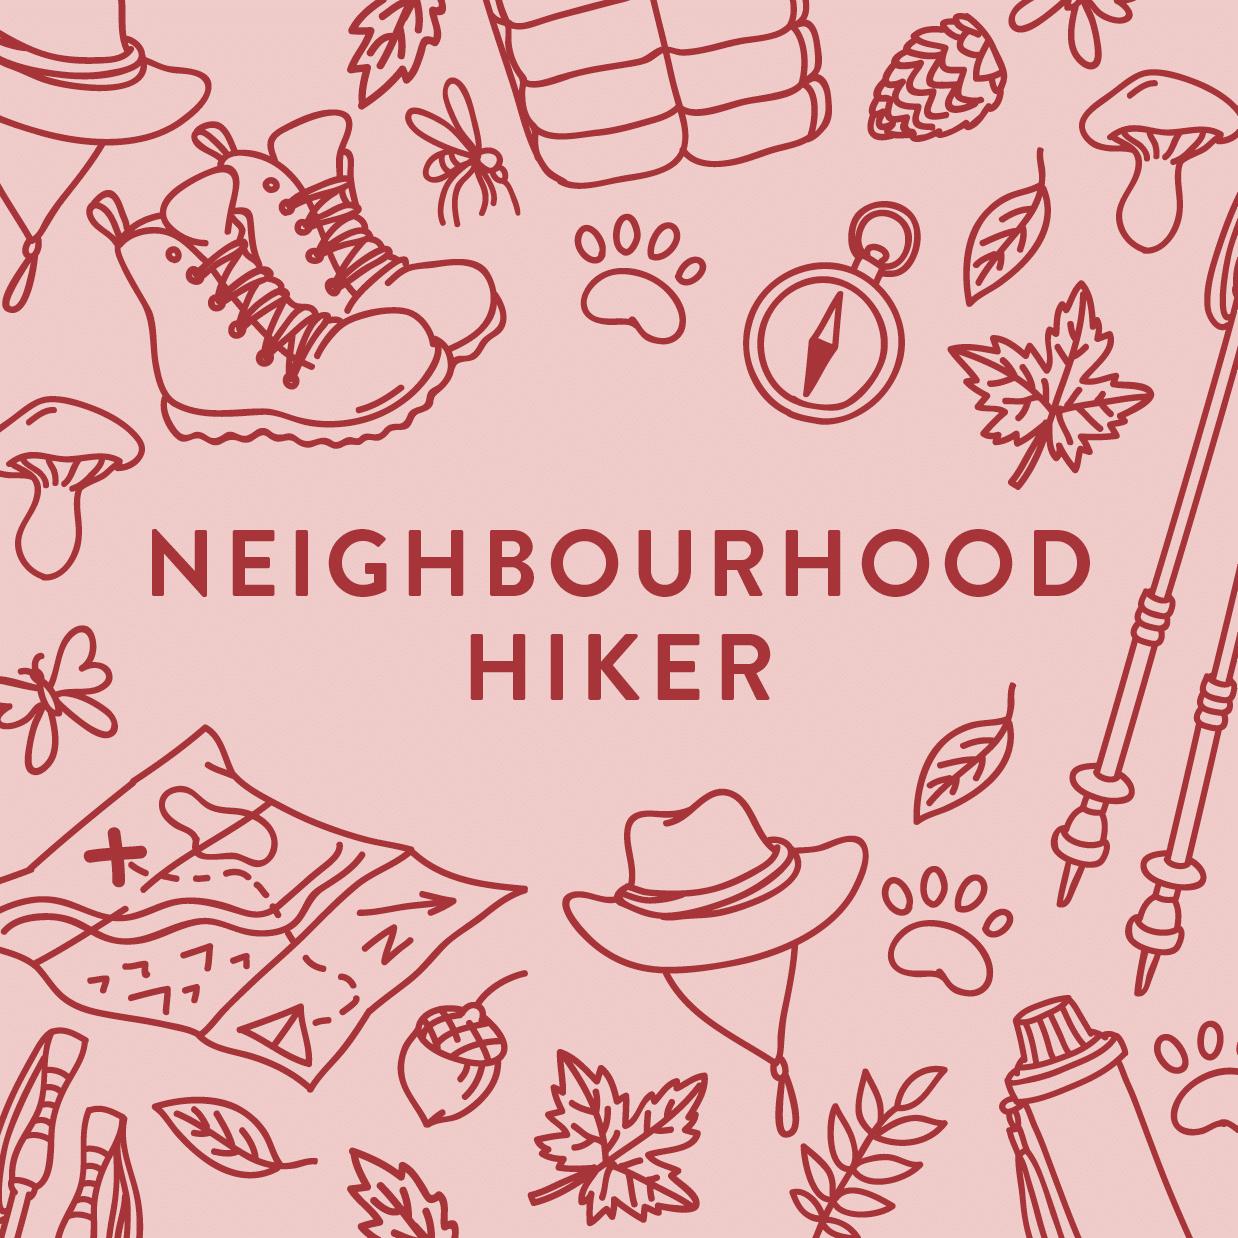 Neighbourhood Hiker graphic